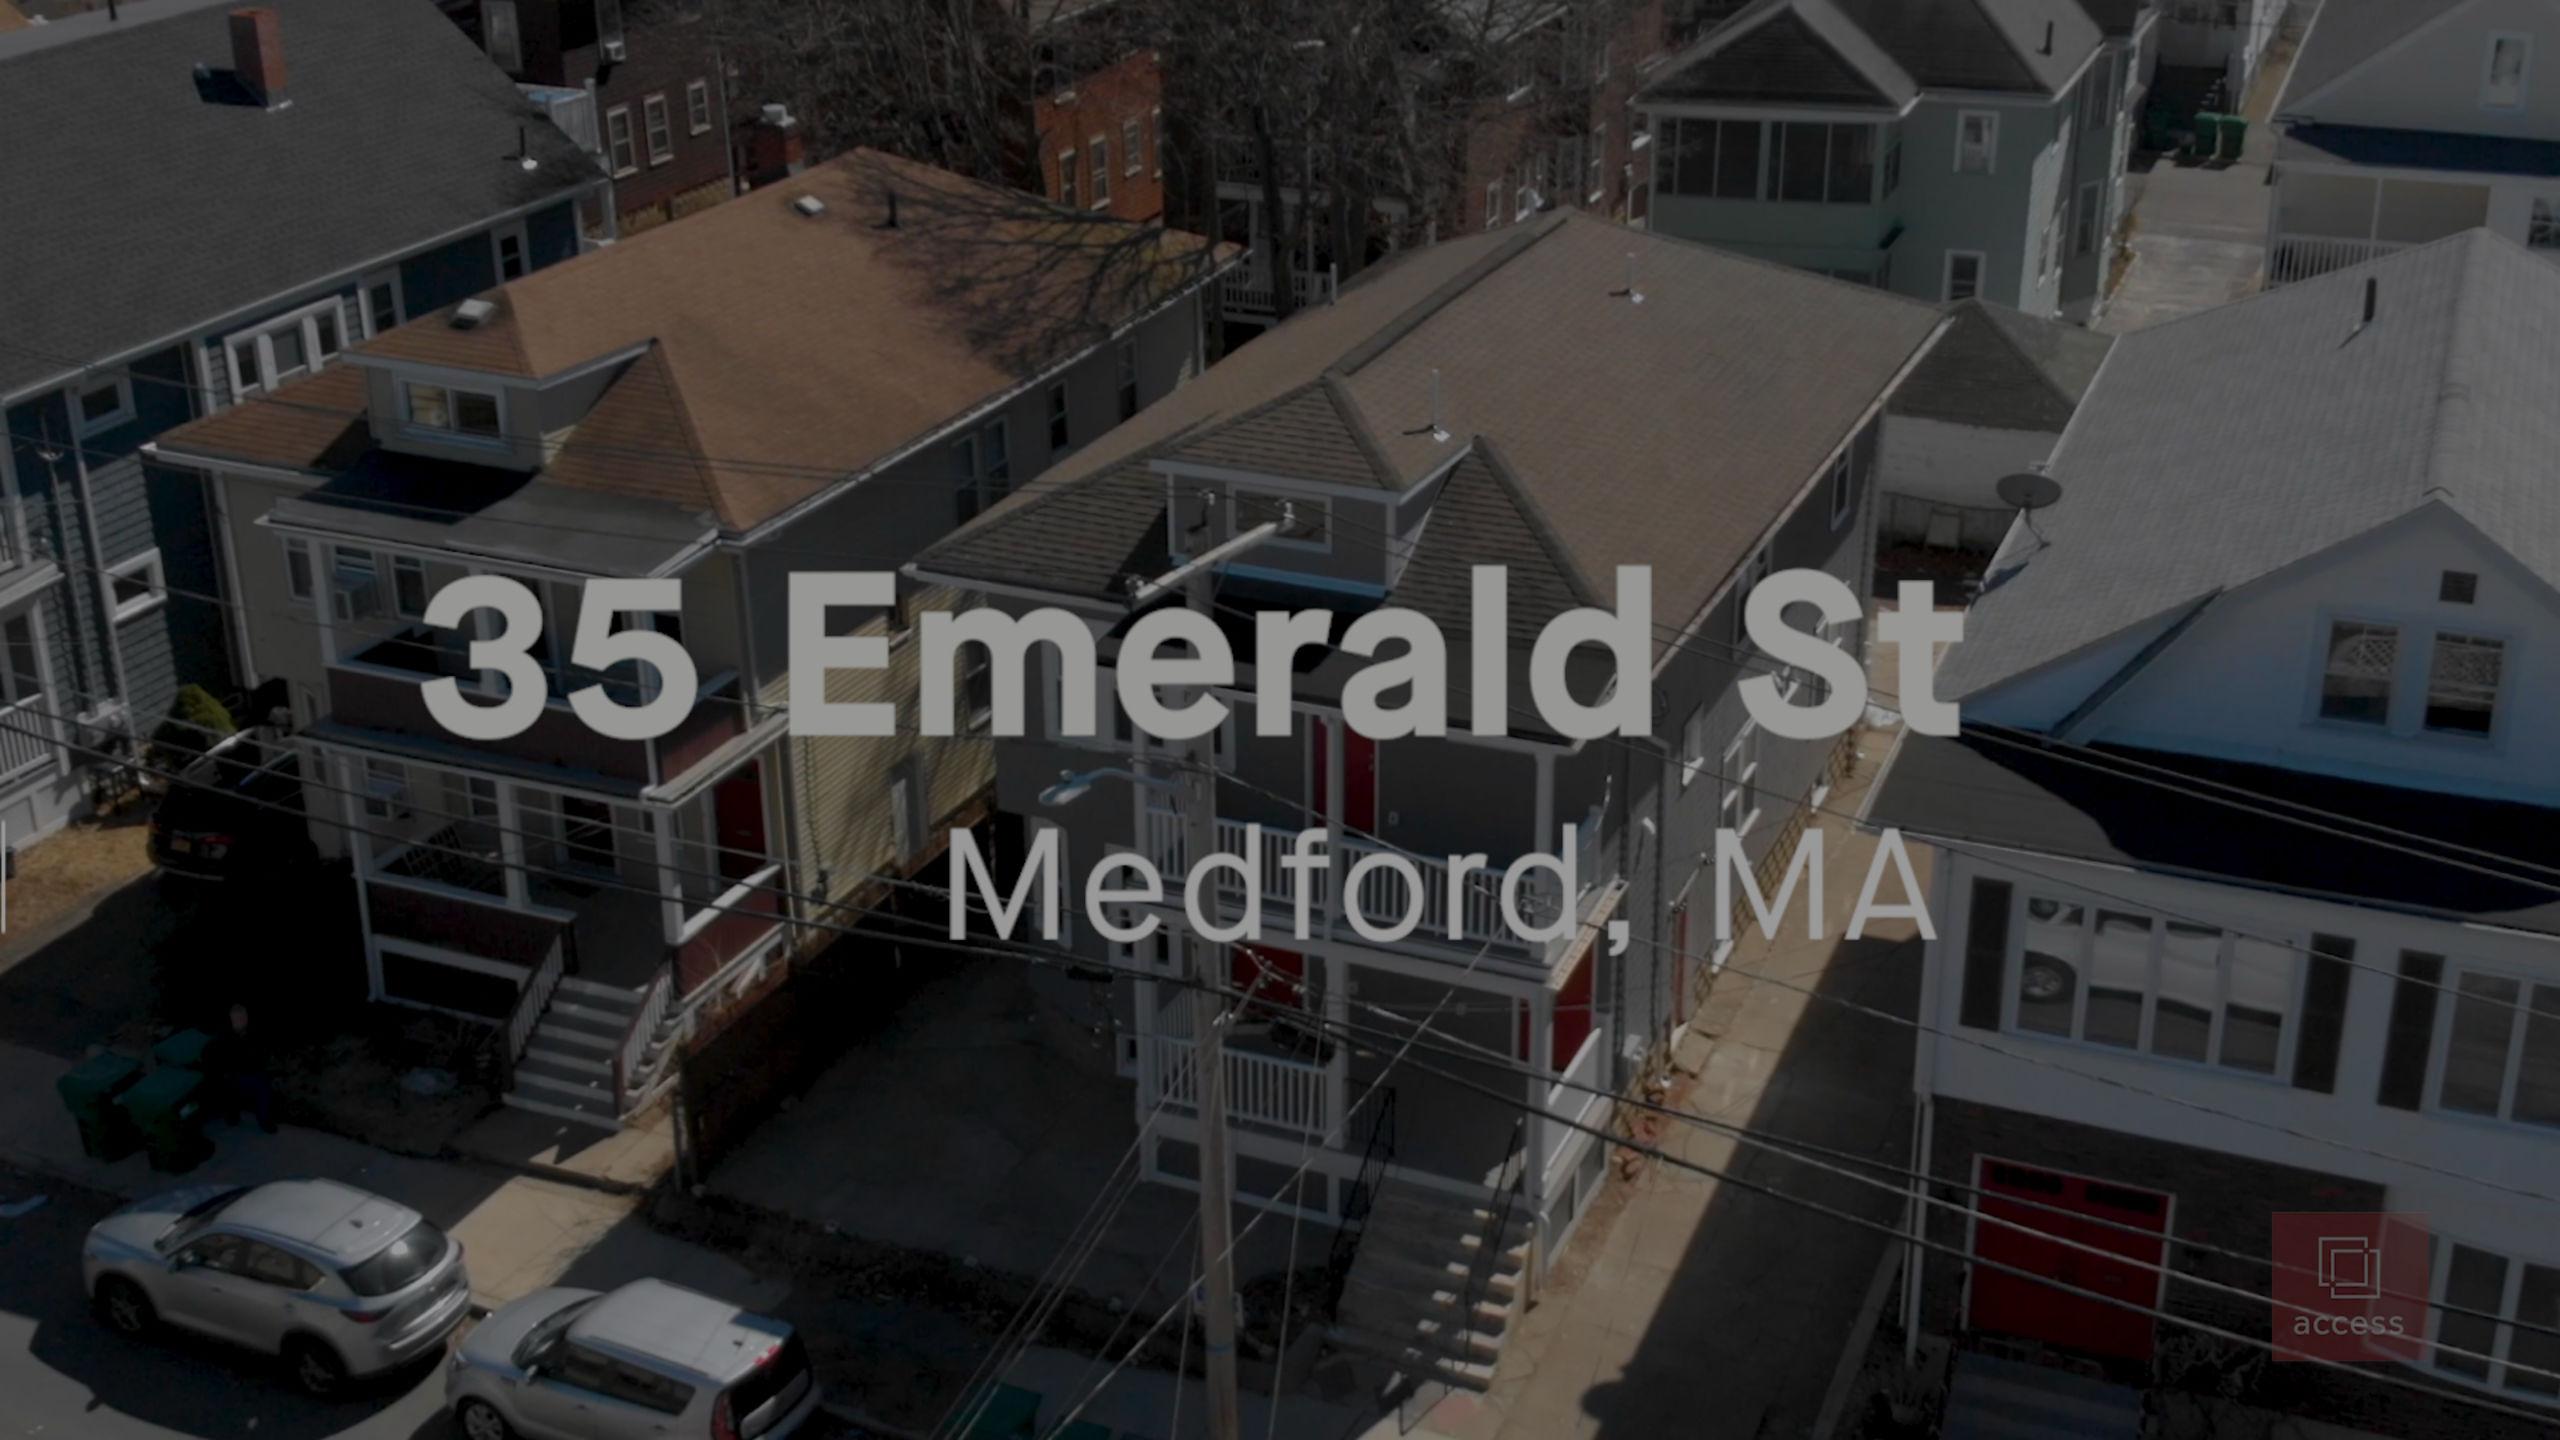 35 Emerald St, Medford